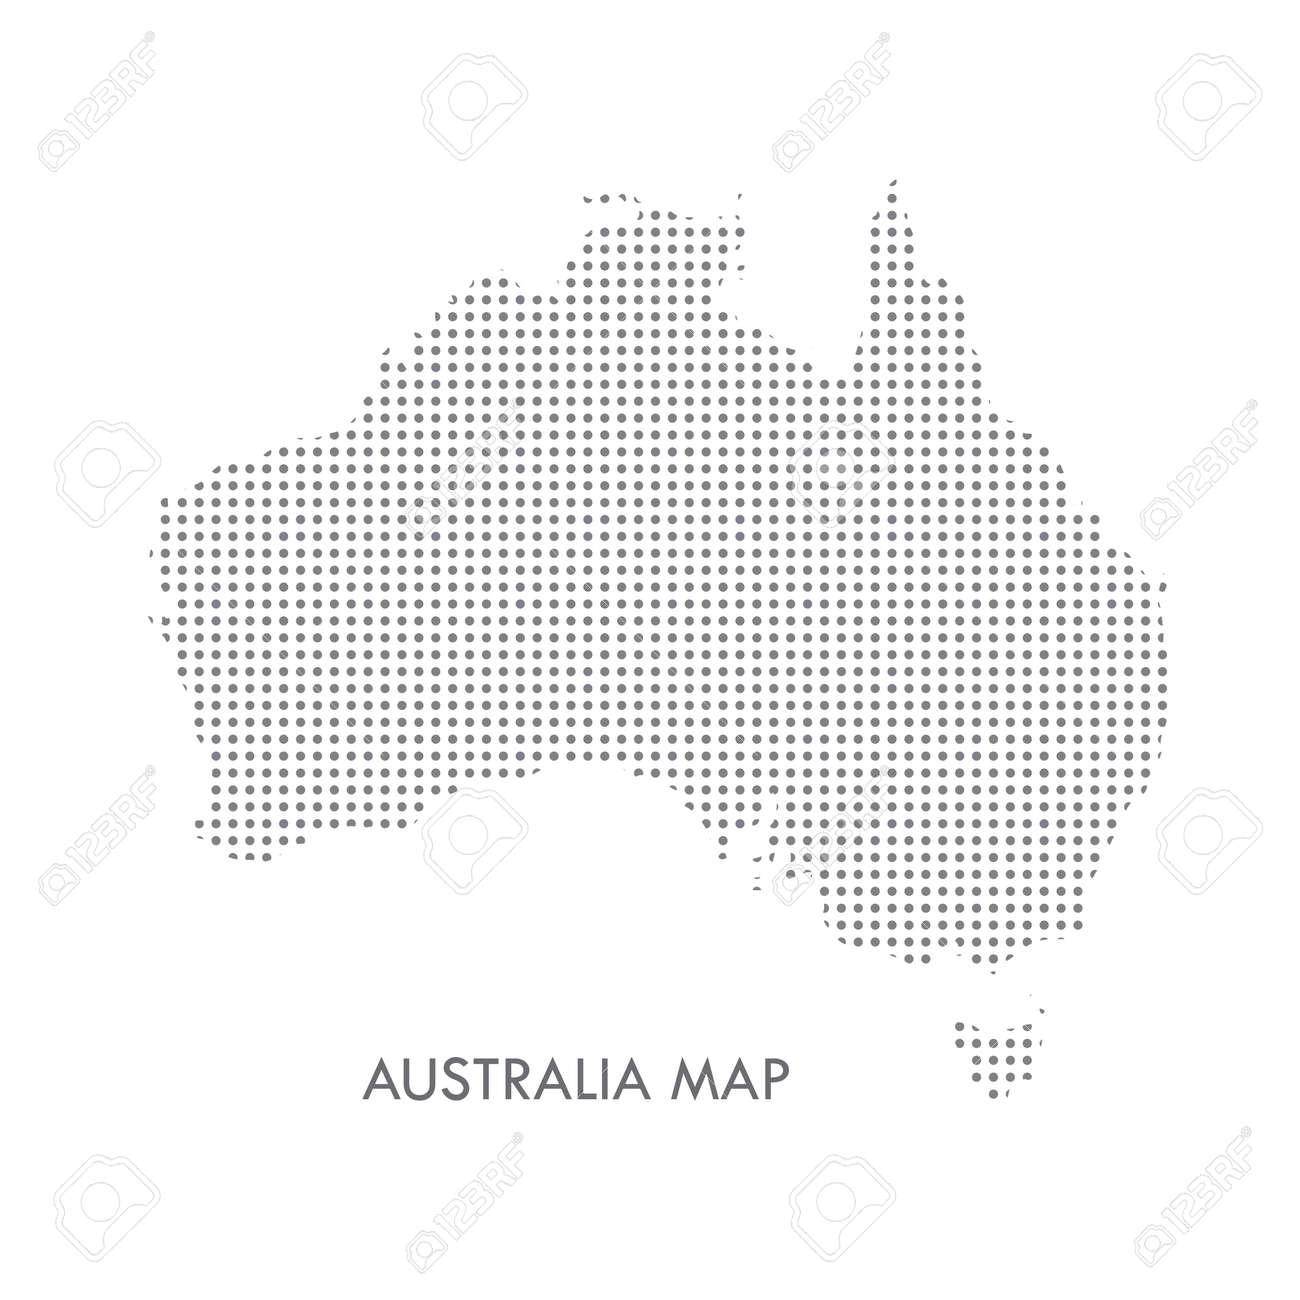 Australia Map Icon.Australia Map Icon With Black Dots Pattern Isolated On White